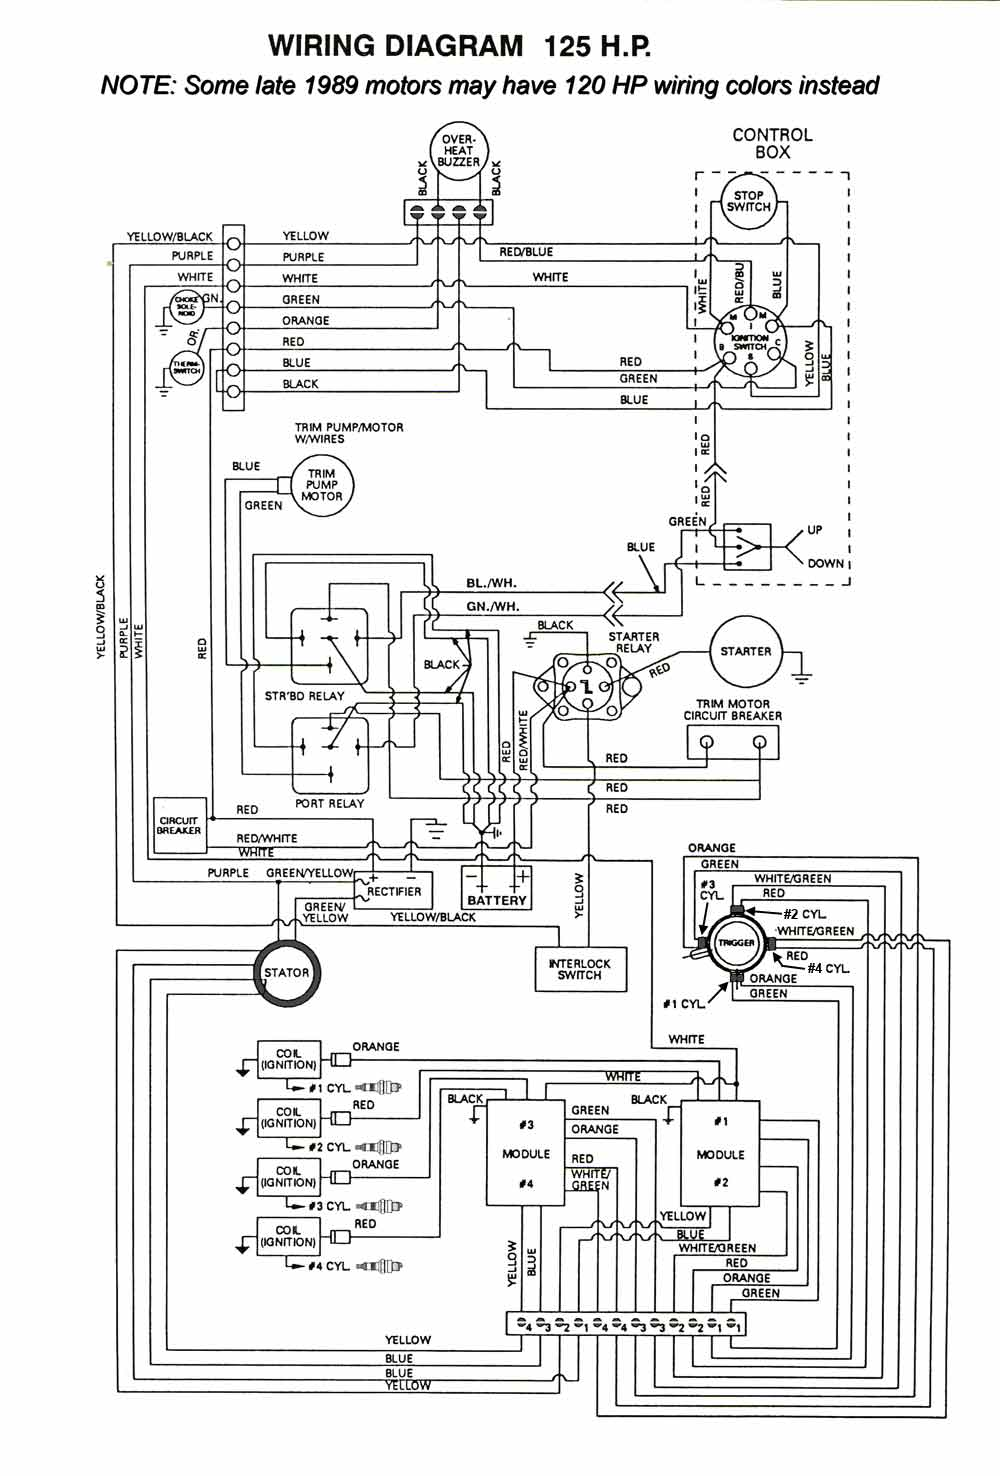 trophy boat wiring diagram de 7802  1987 bayliner capri bowrider wiring diagram wiring diagram  1987 bayliner capri bowrider wiring